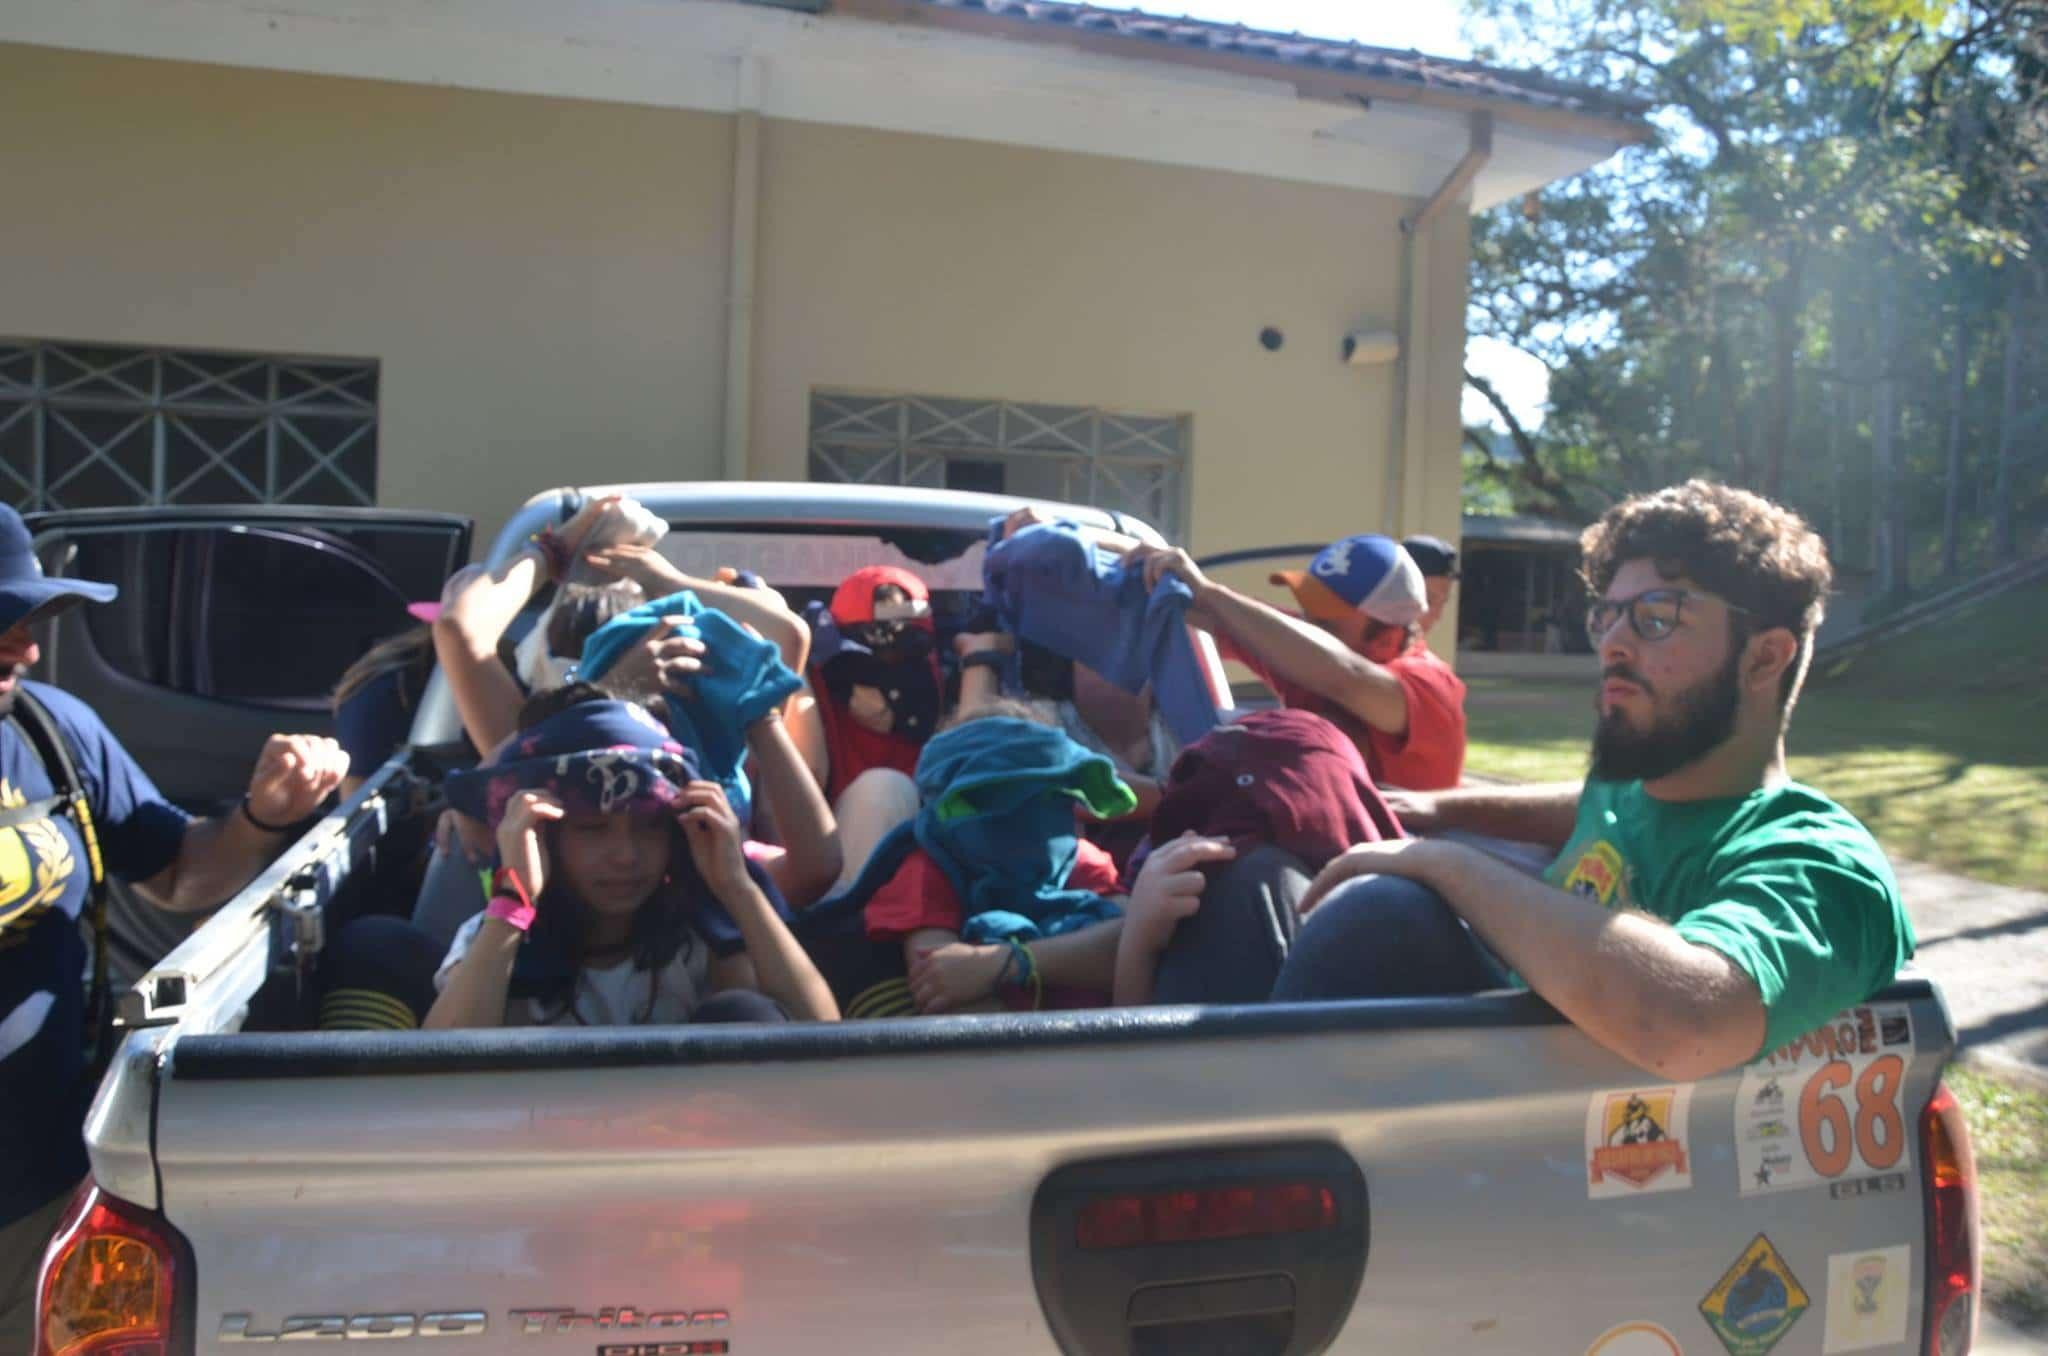 Atividades de 11 a 17 anos Acampamento dos Pumas (2)